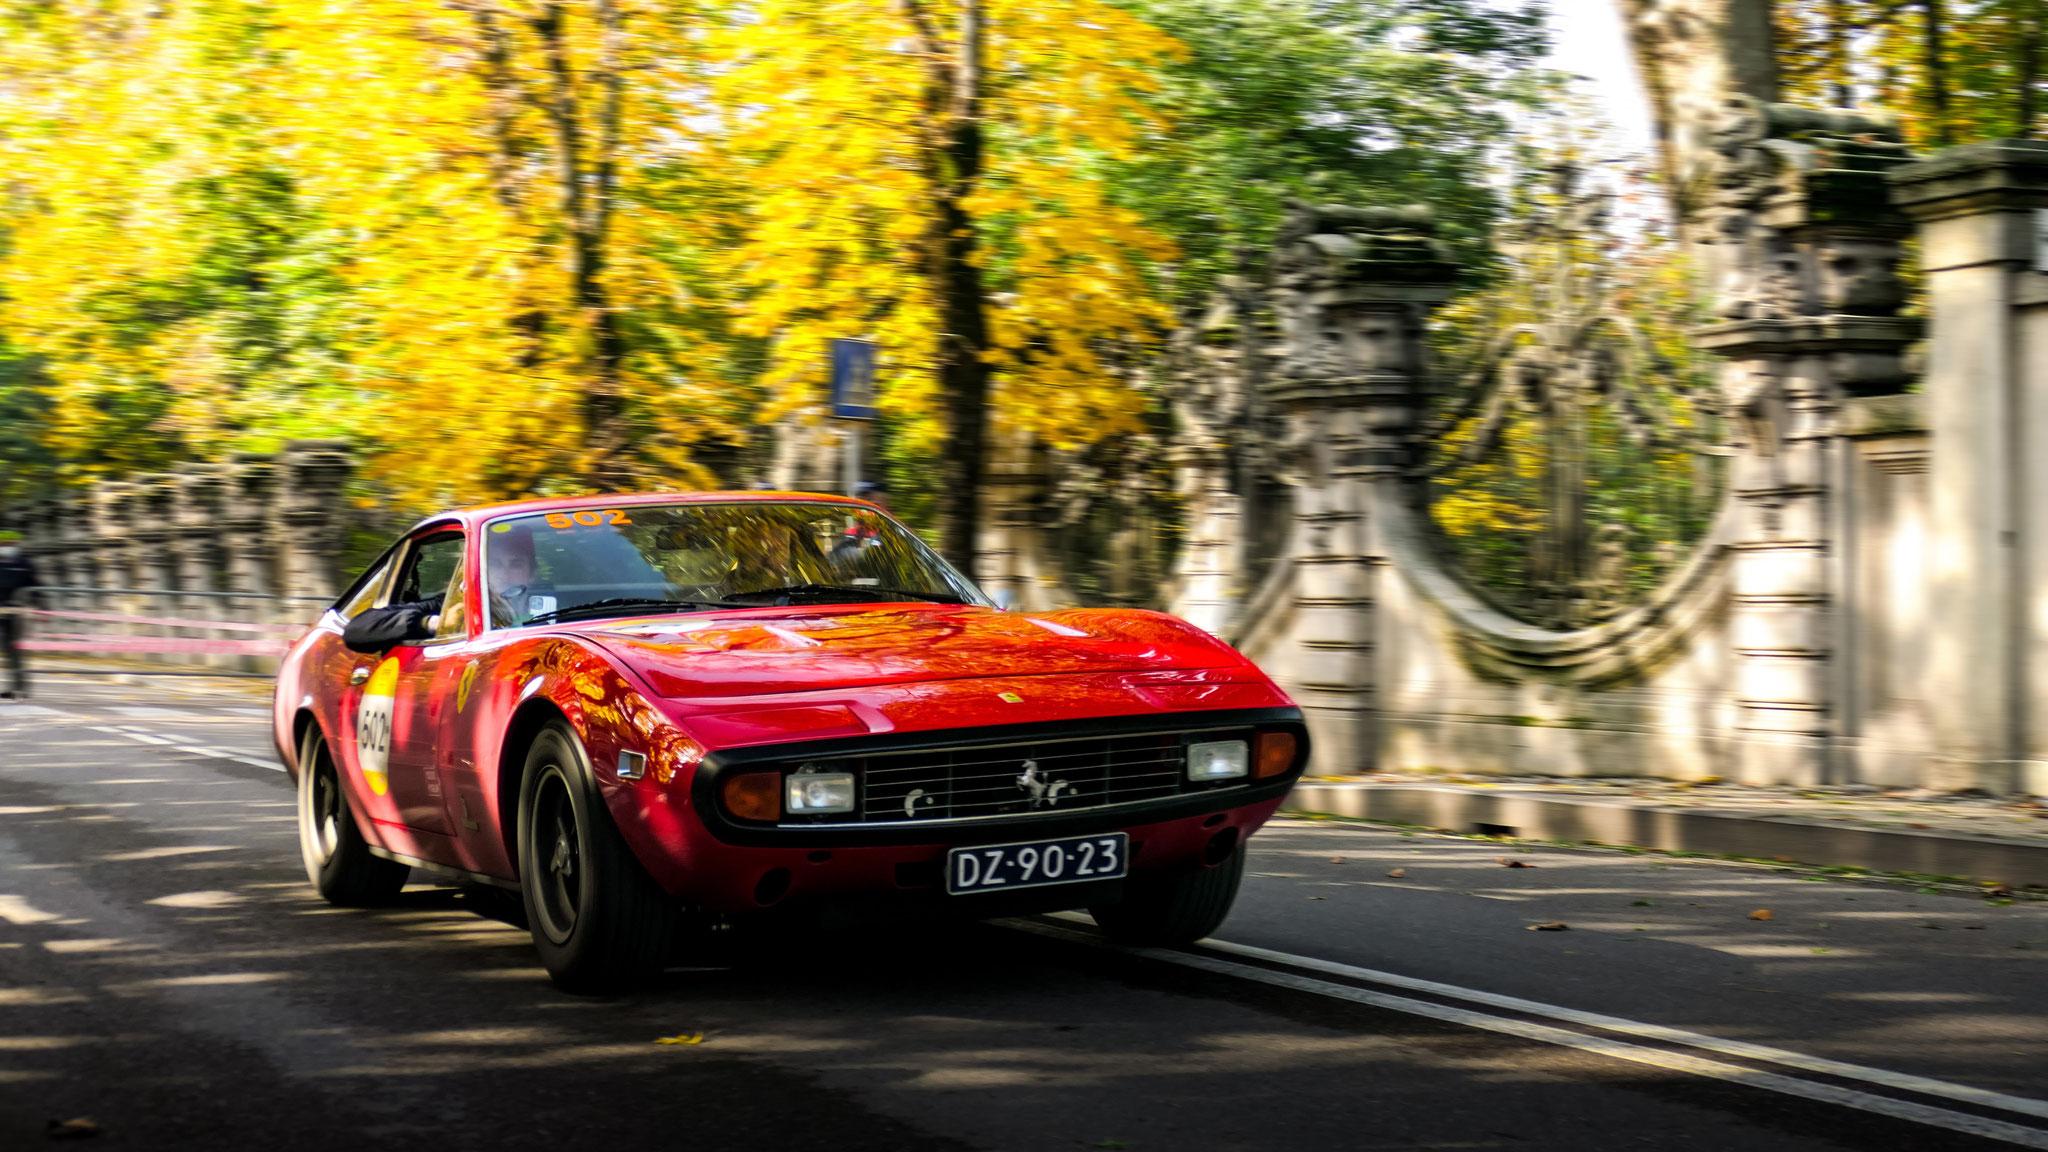 Ferrari 365 GTC4 - DZ-90-23 (ITA)